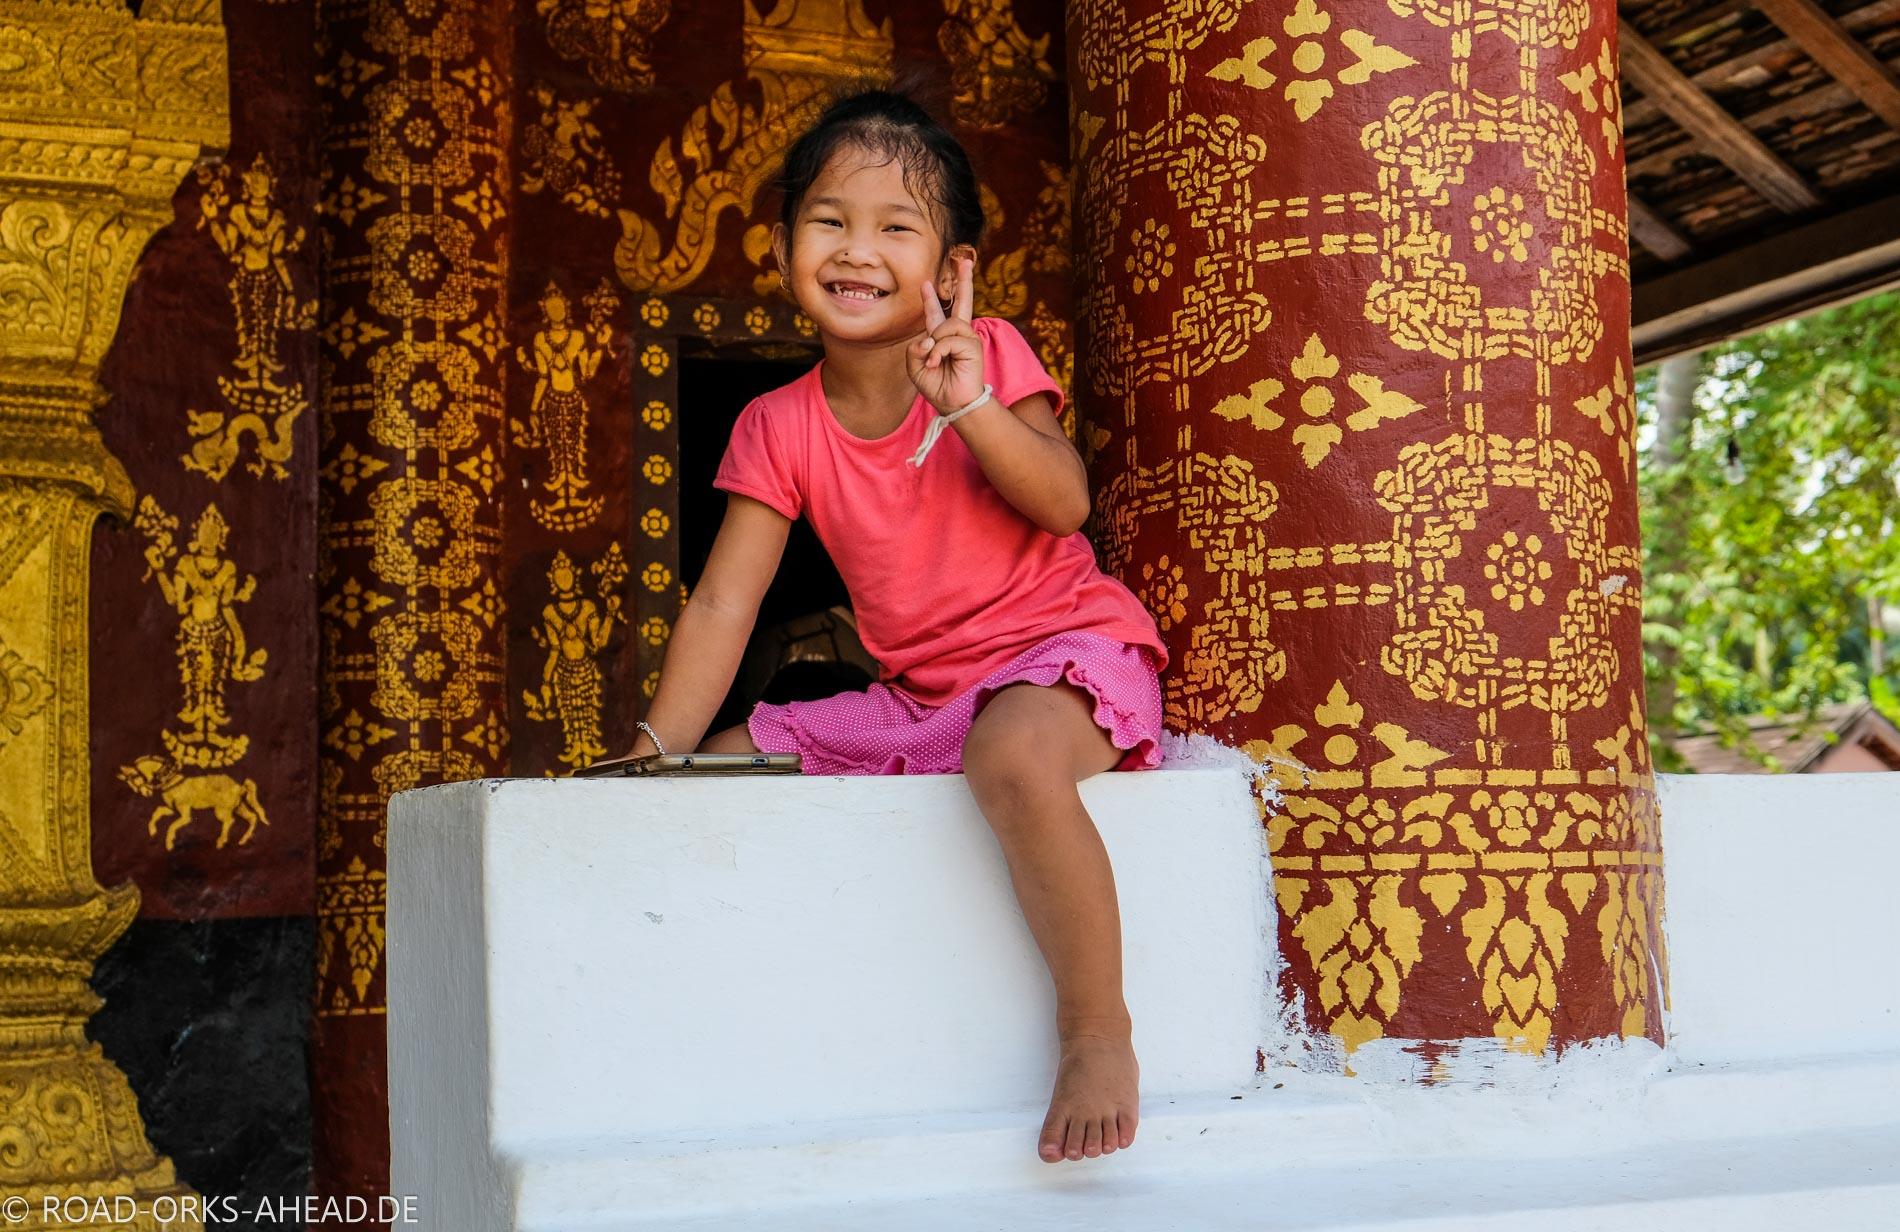 Mädchen im Tempel, Luang Prabang